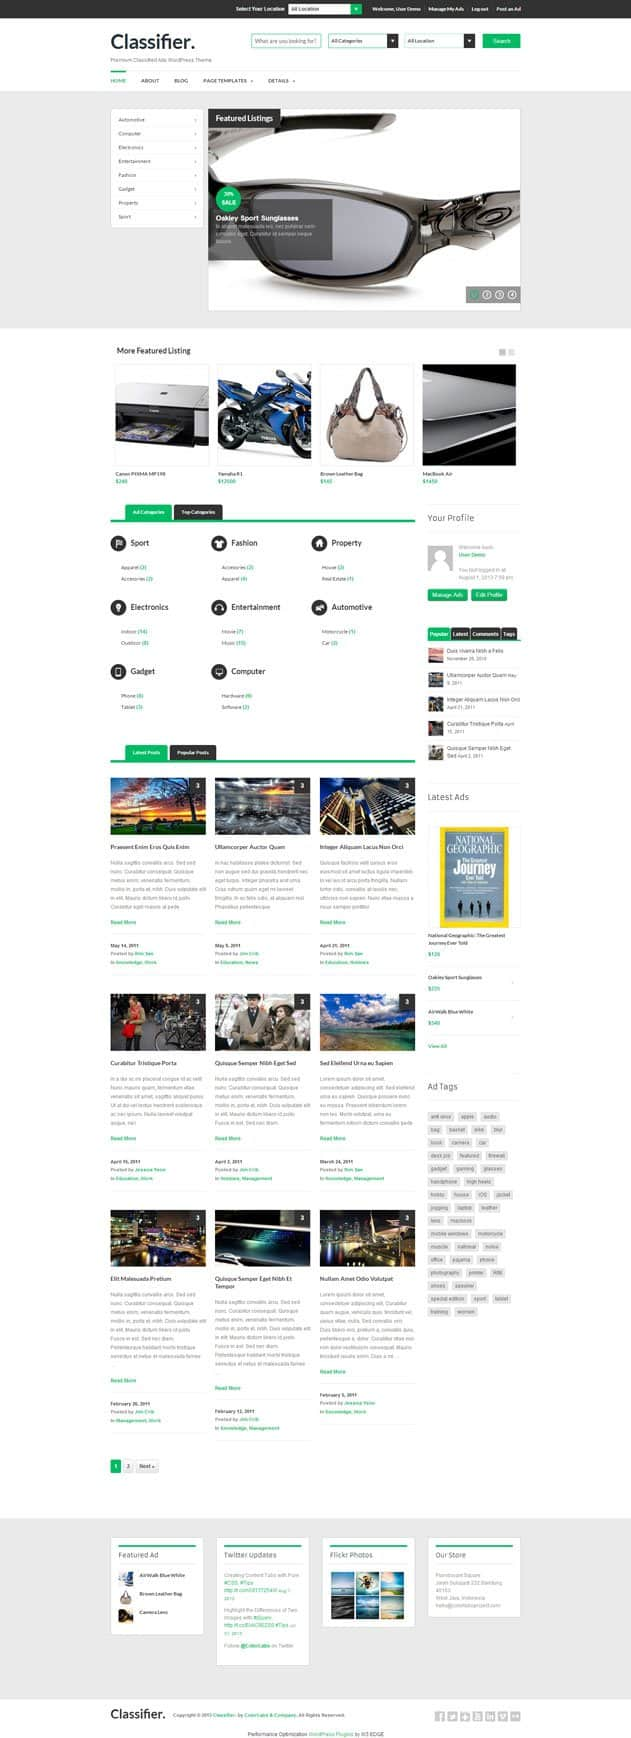 Classifier-Classified-Ads-WordPress-Theme